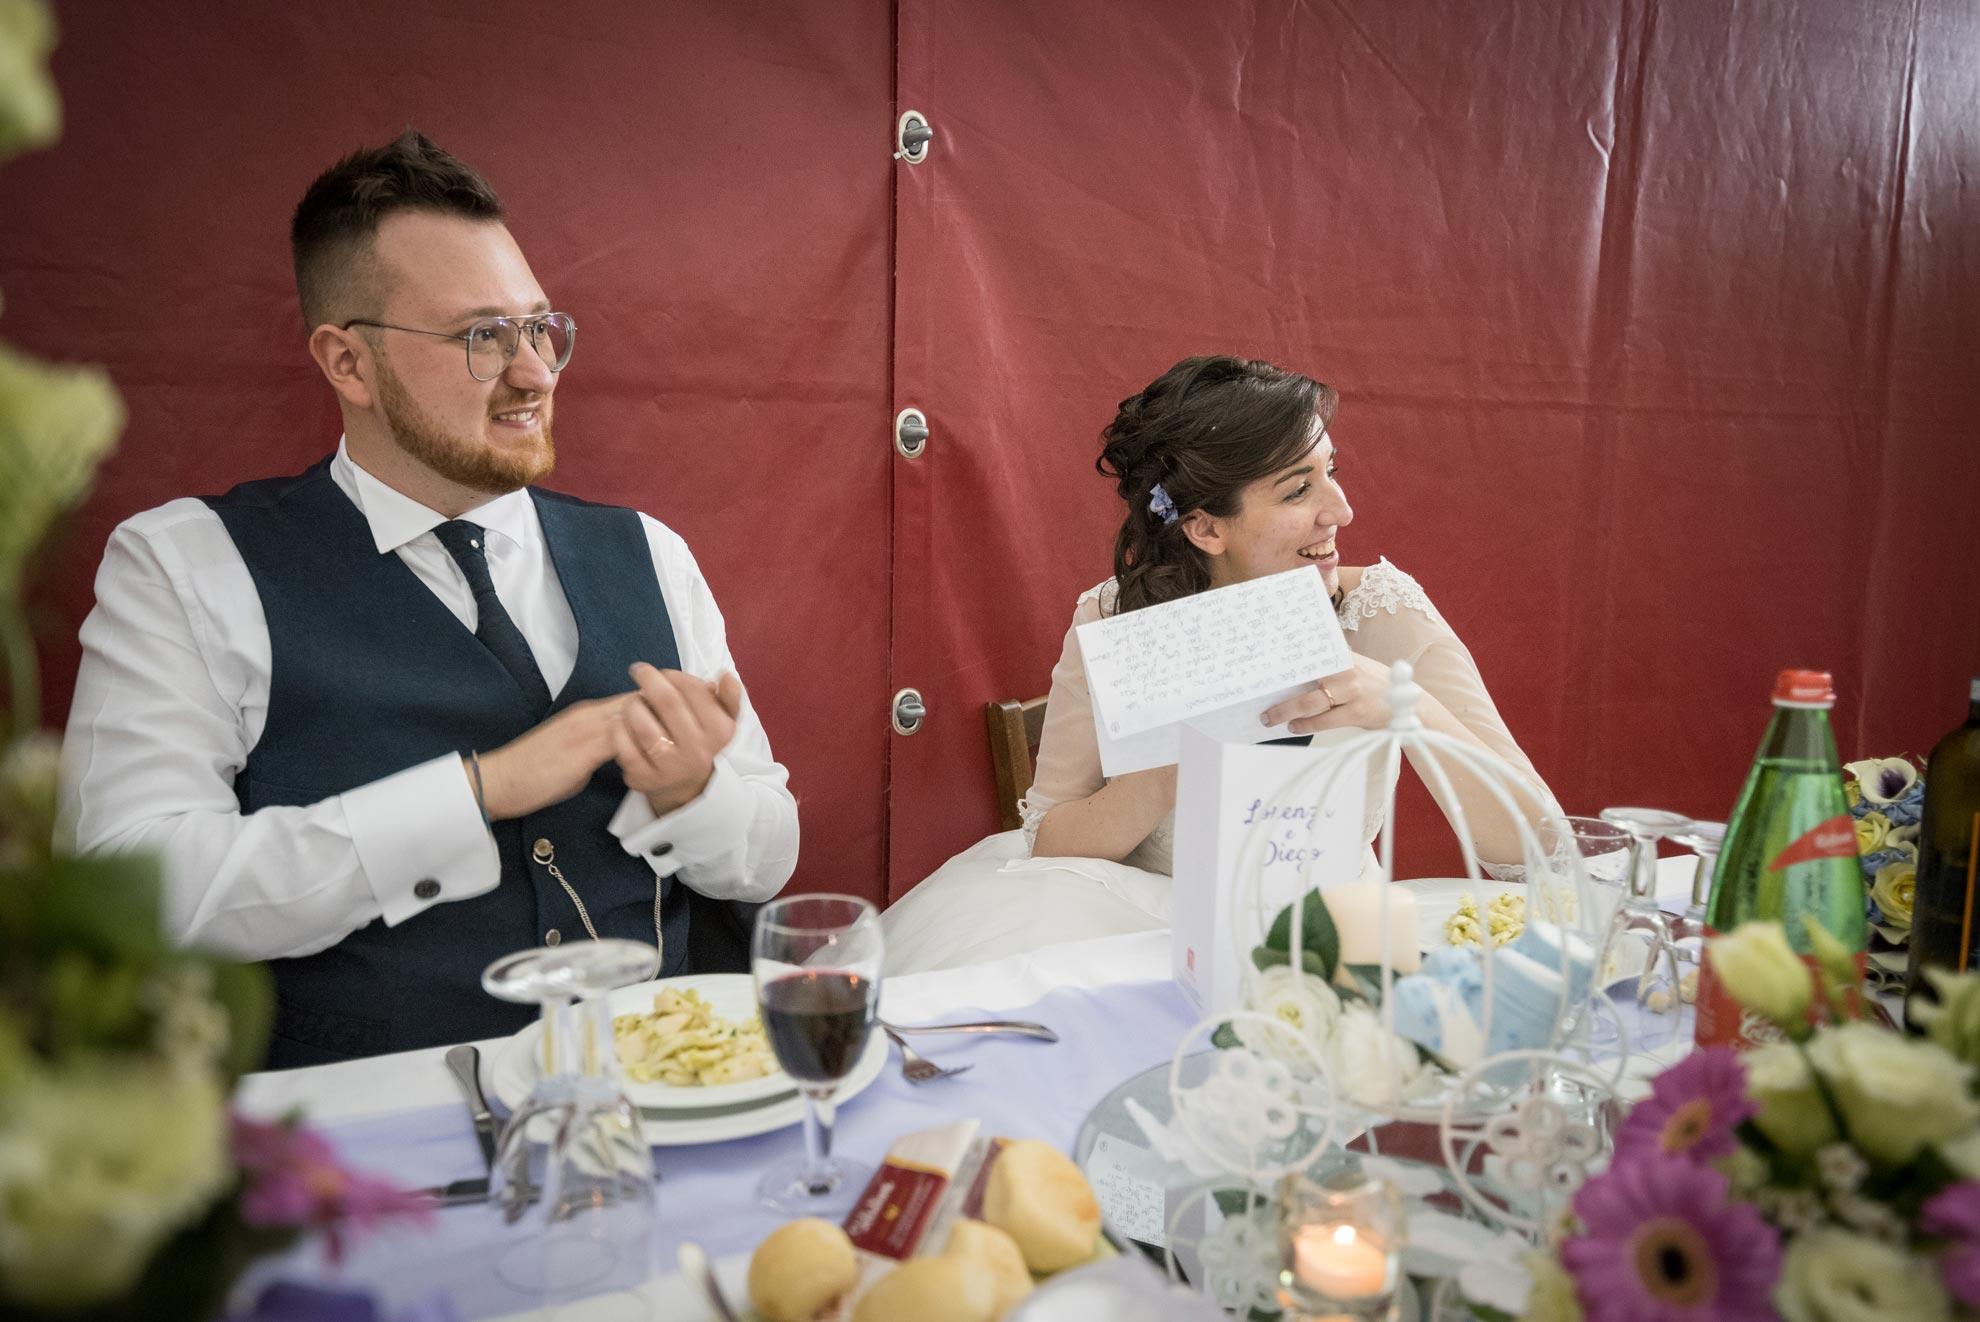 Matrimonio a Narzole Lorenza Diego - DSC 0797 - Fotografo matrimonio nel Roero - Fotografo matrimonio nel Roero